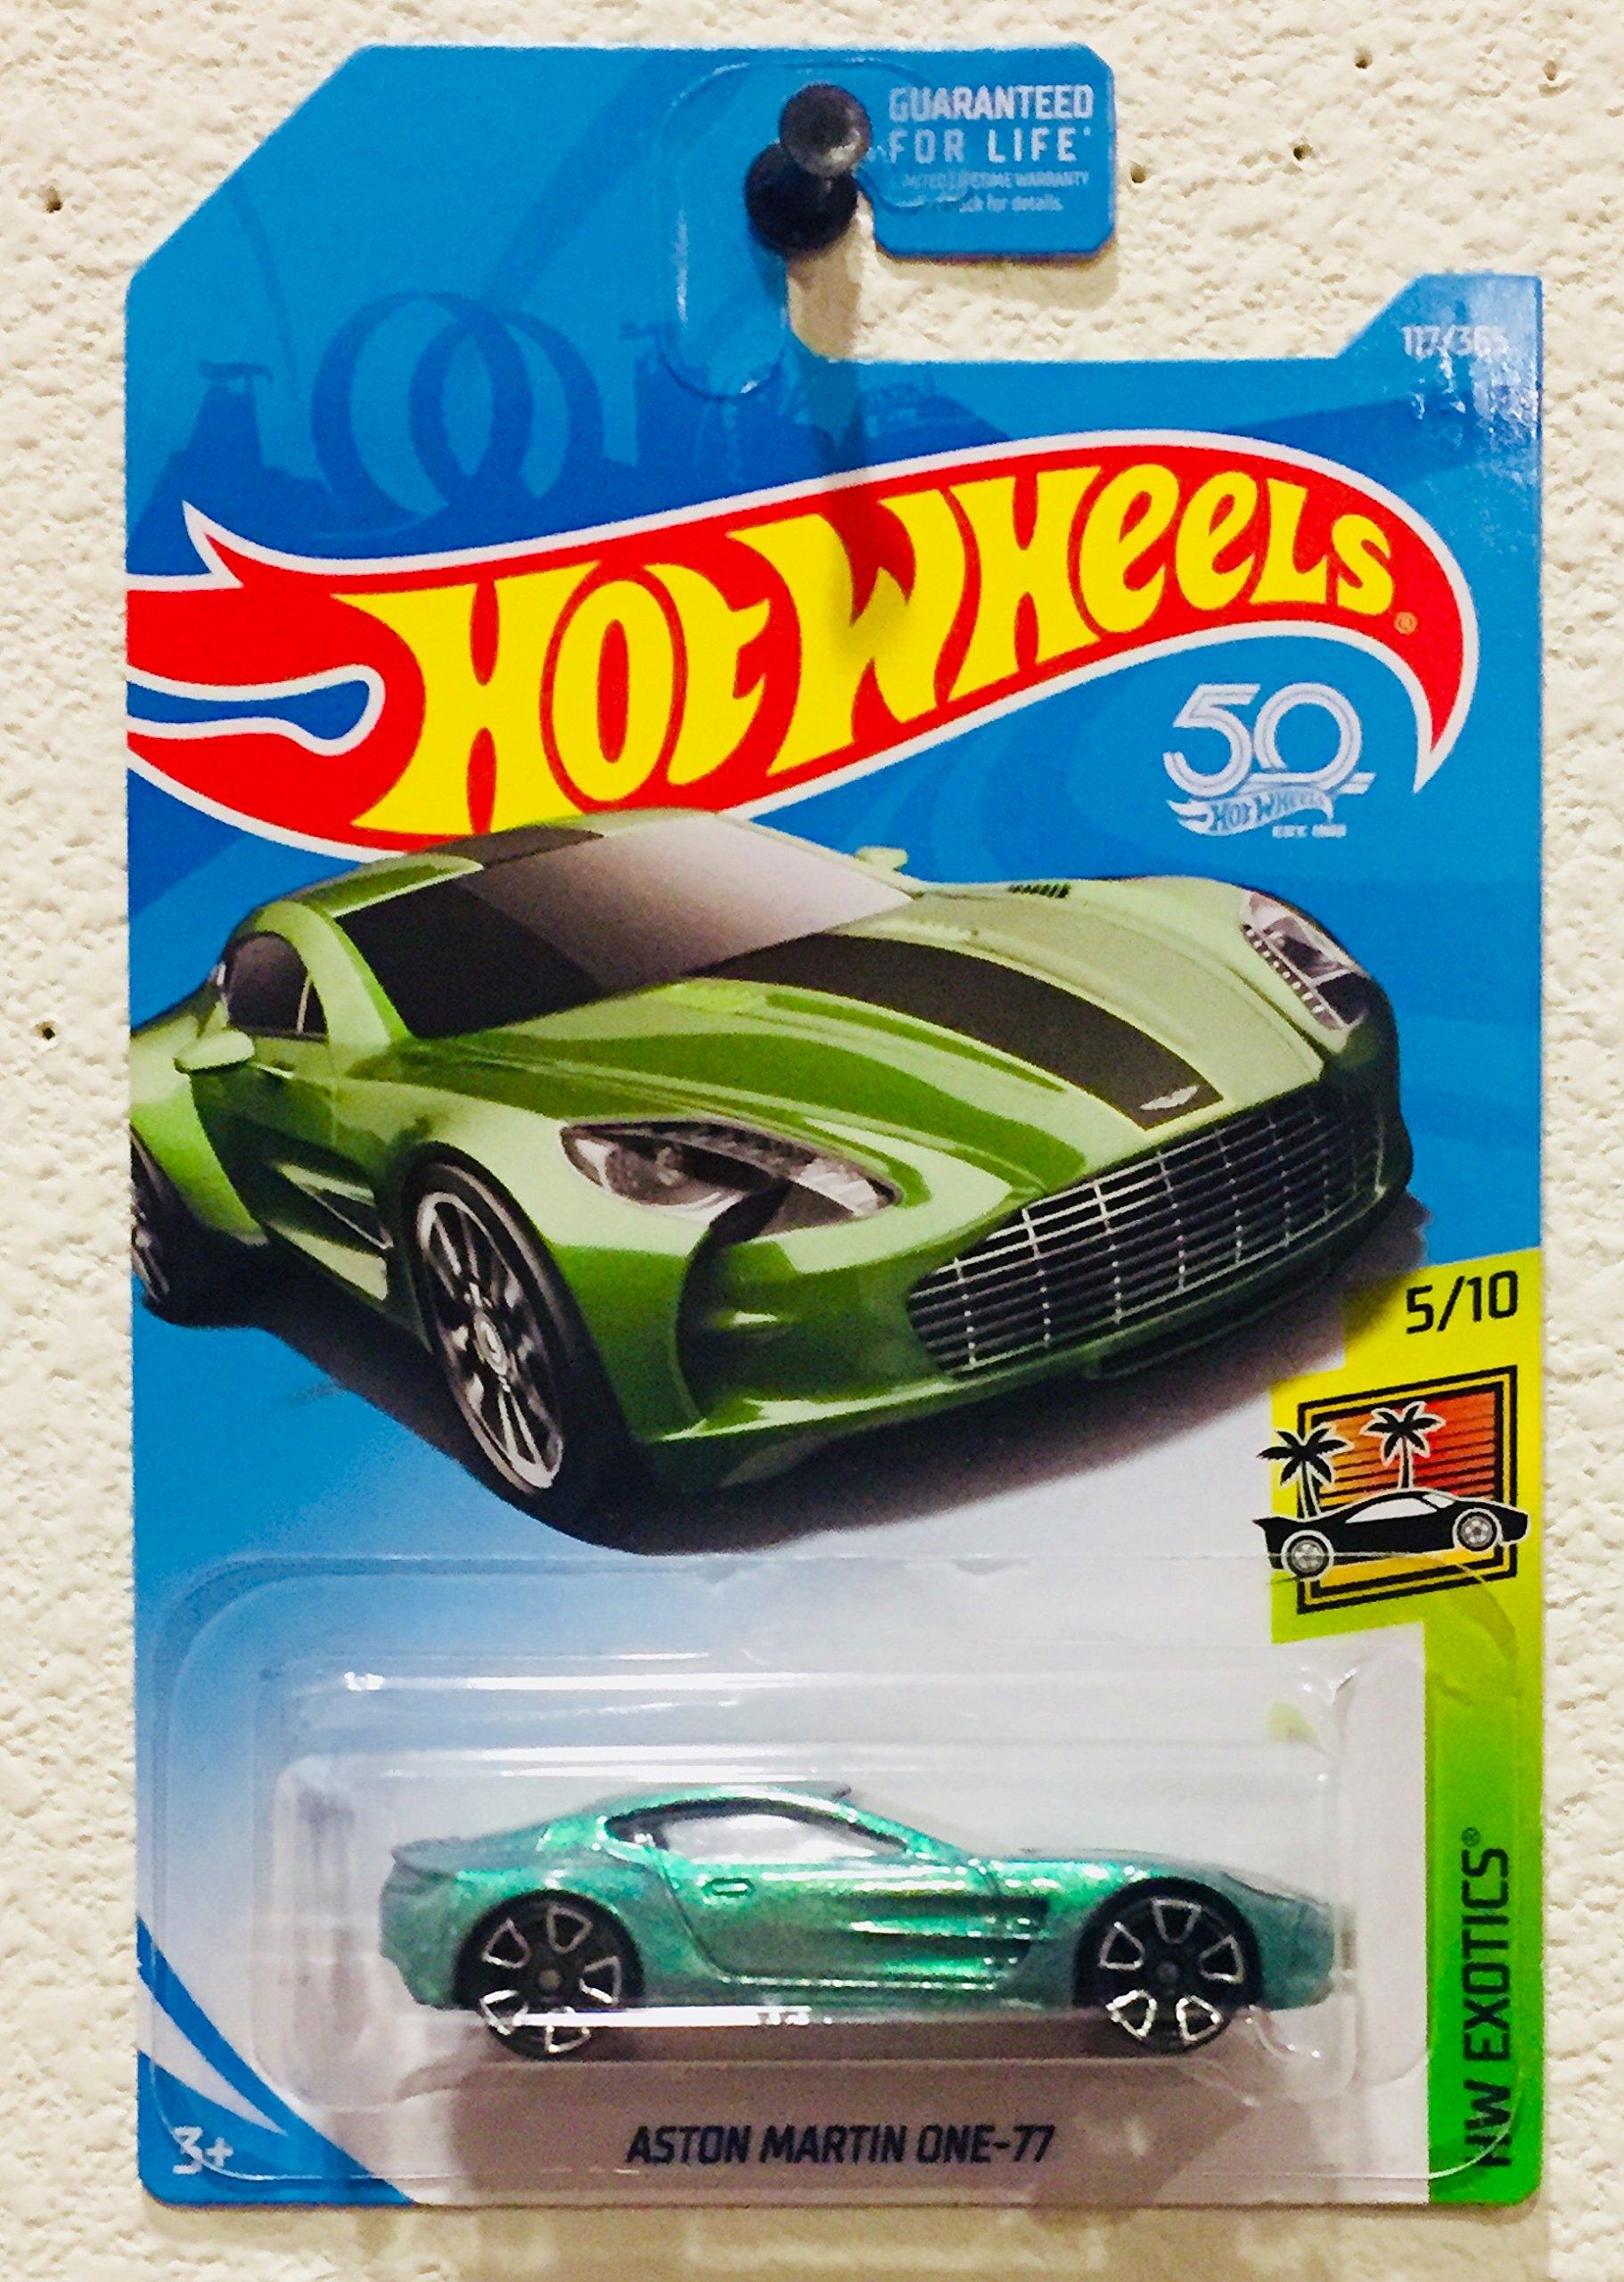 Hot Wheels 2018 50th Anniversary HW Exotics Aston Martin One-77 117/365, Pale Green